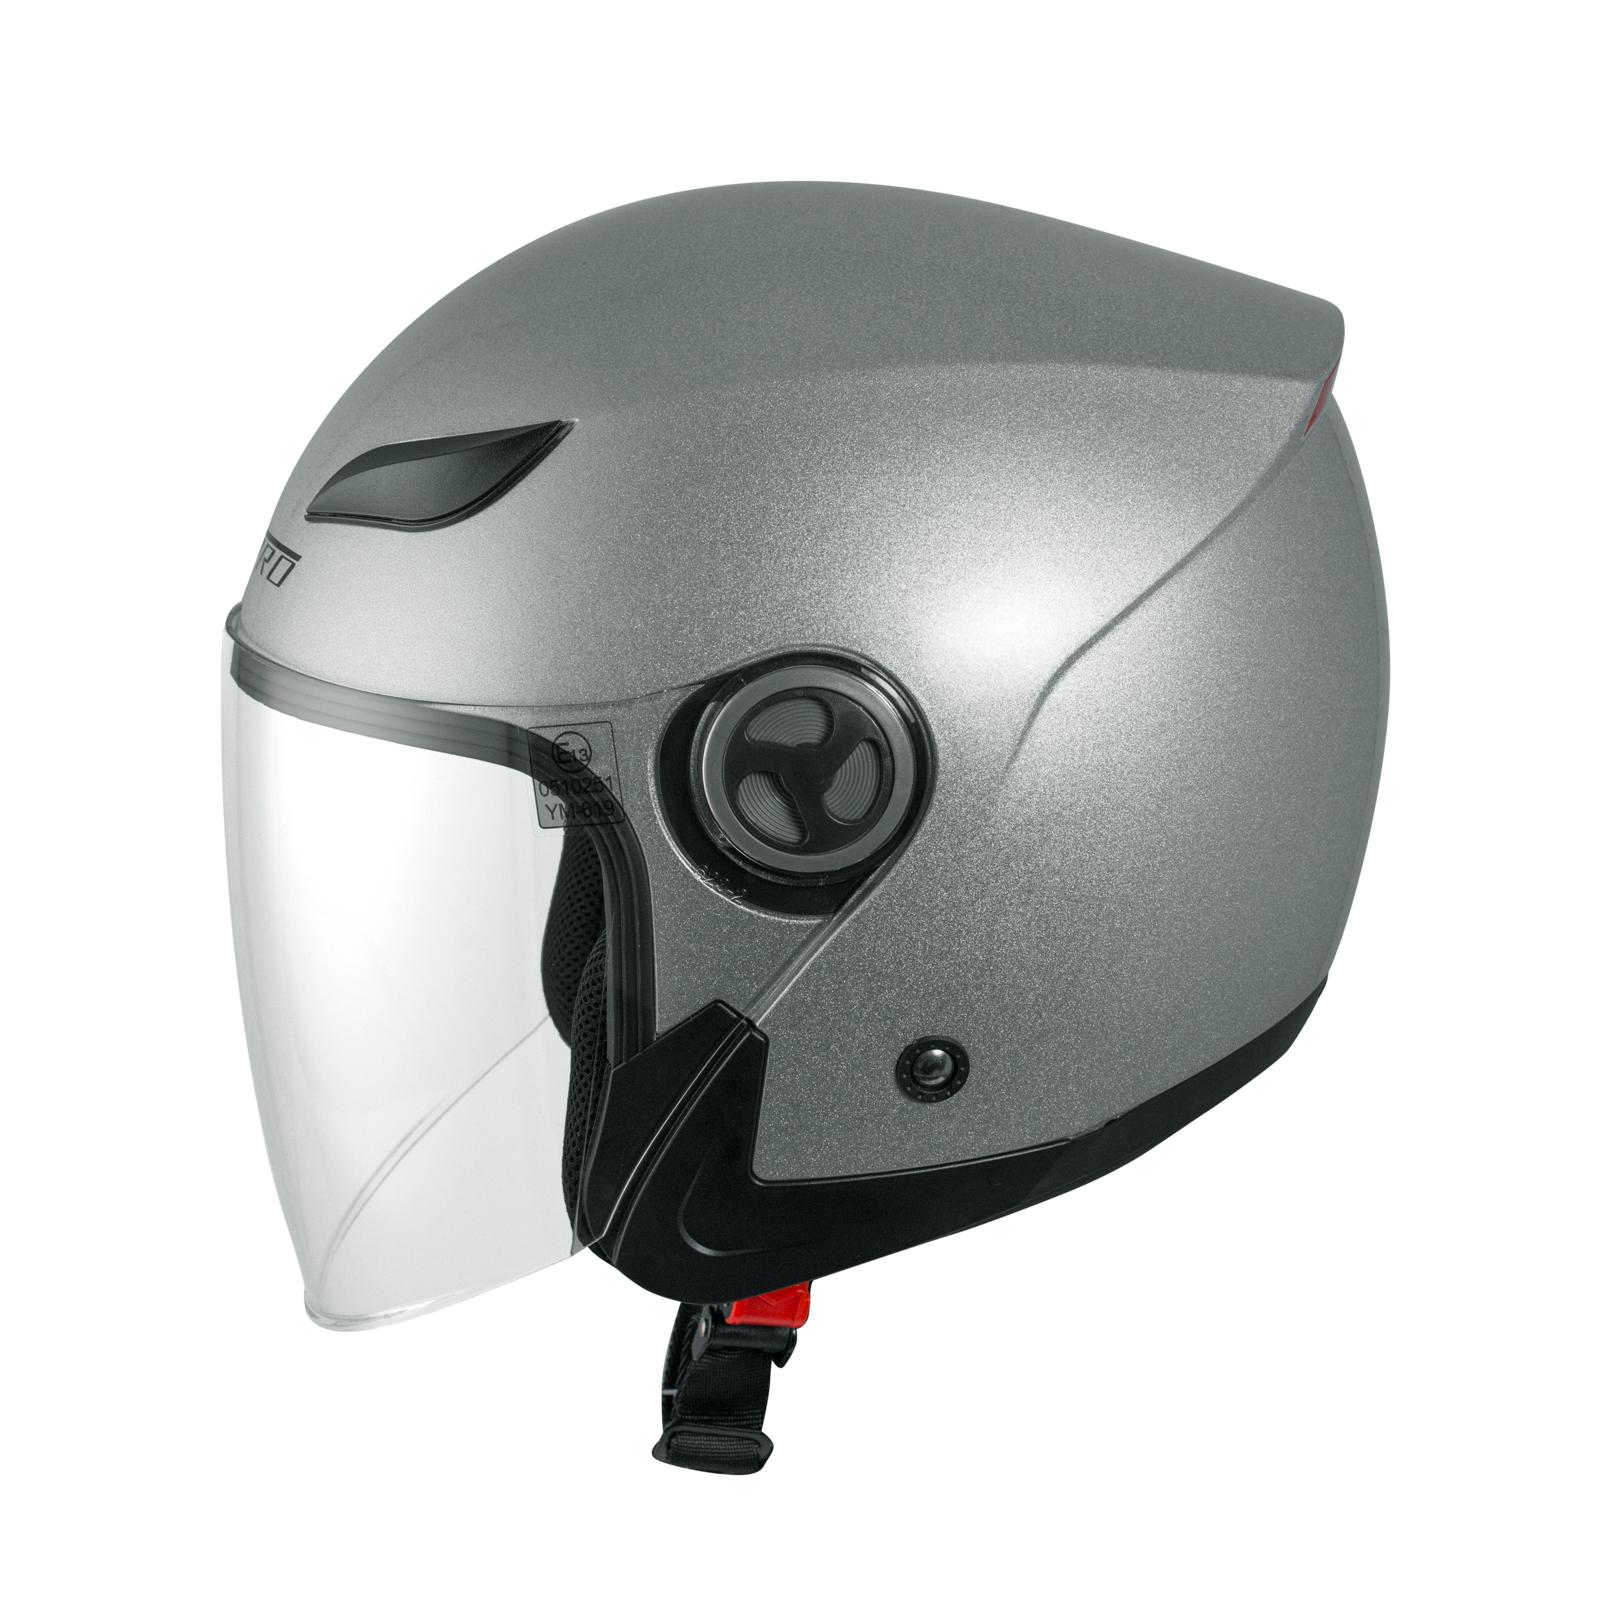 Casco-Jet-Visiera-Lunga-Scooter-Moto-Quad-Omologato-ECE-22-05-Argento